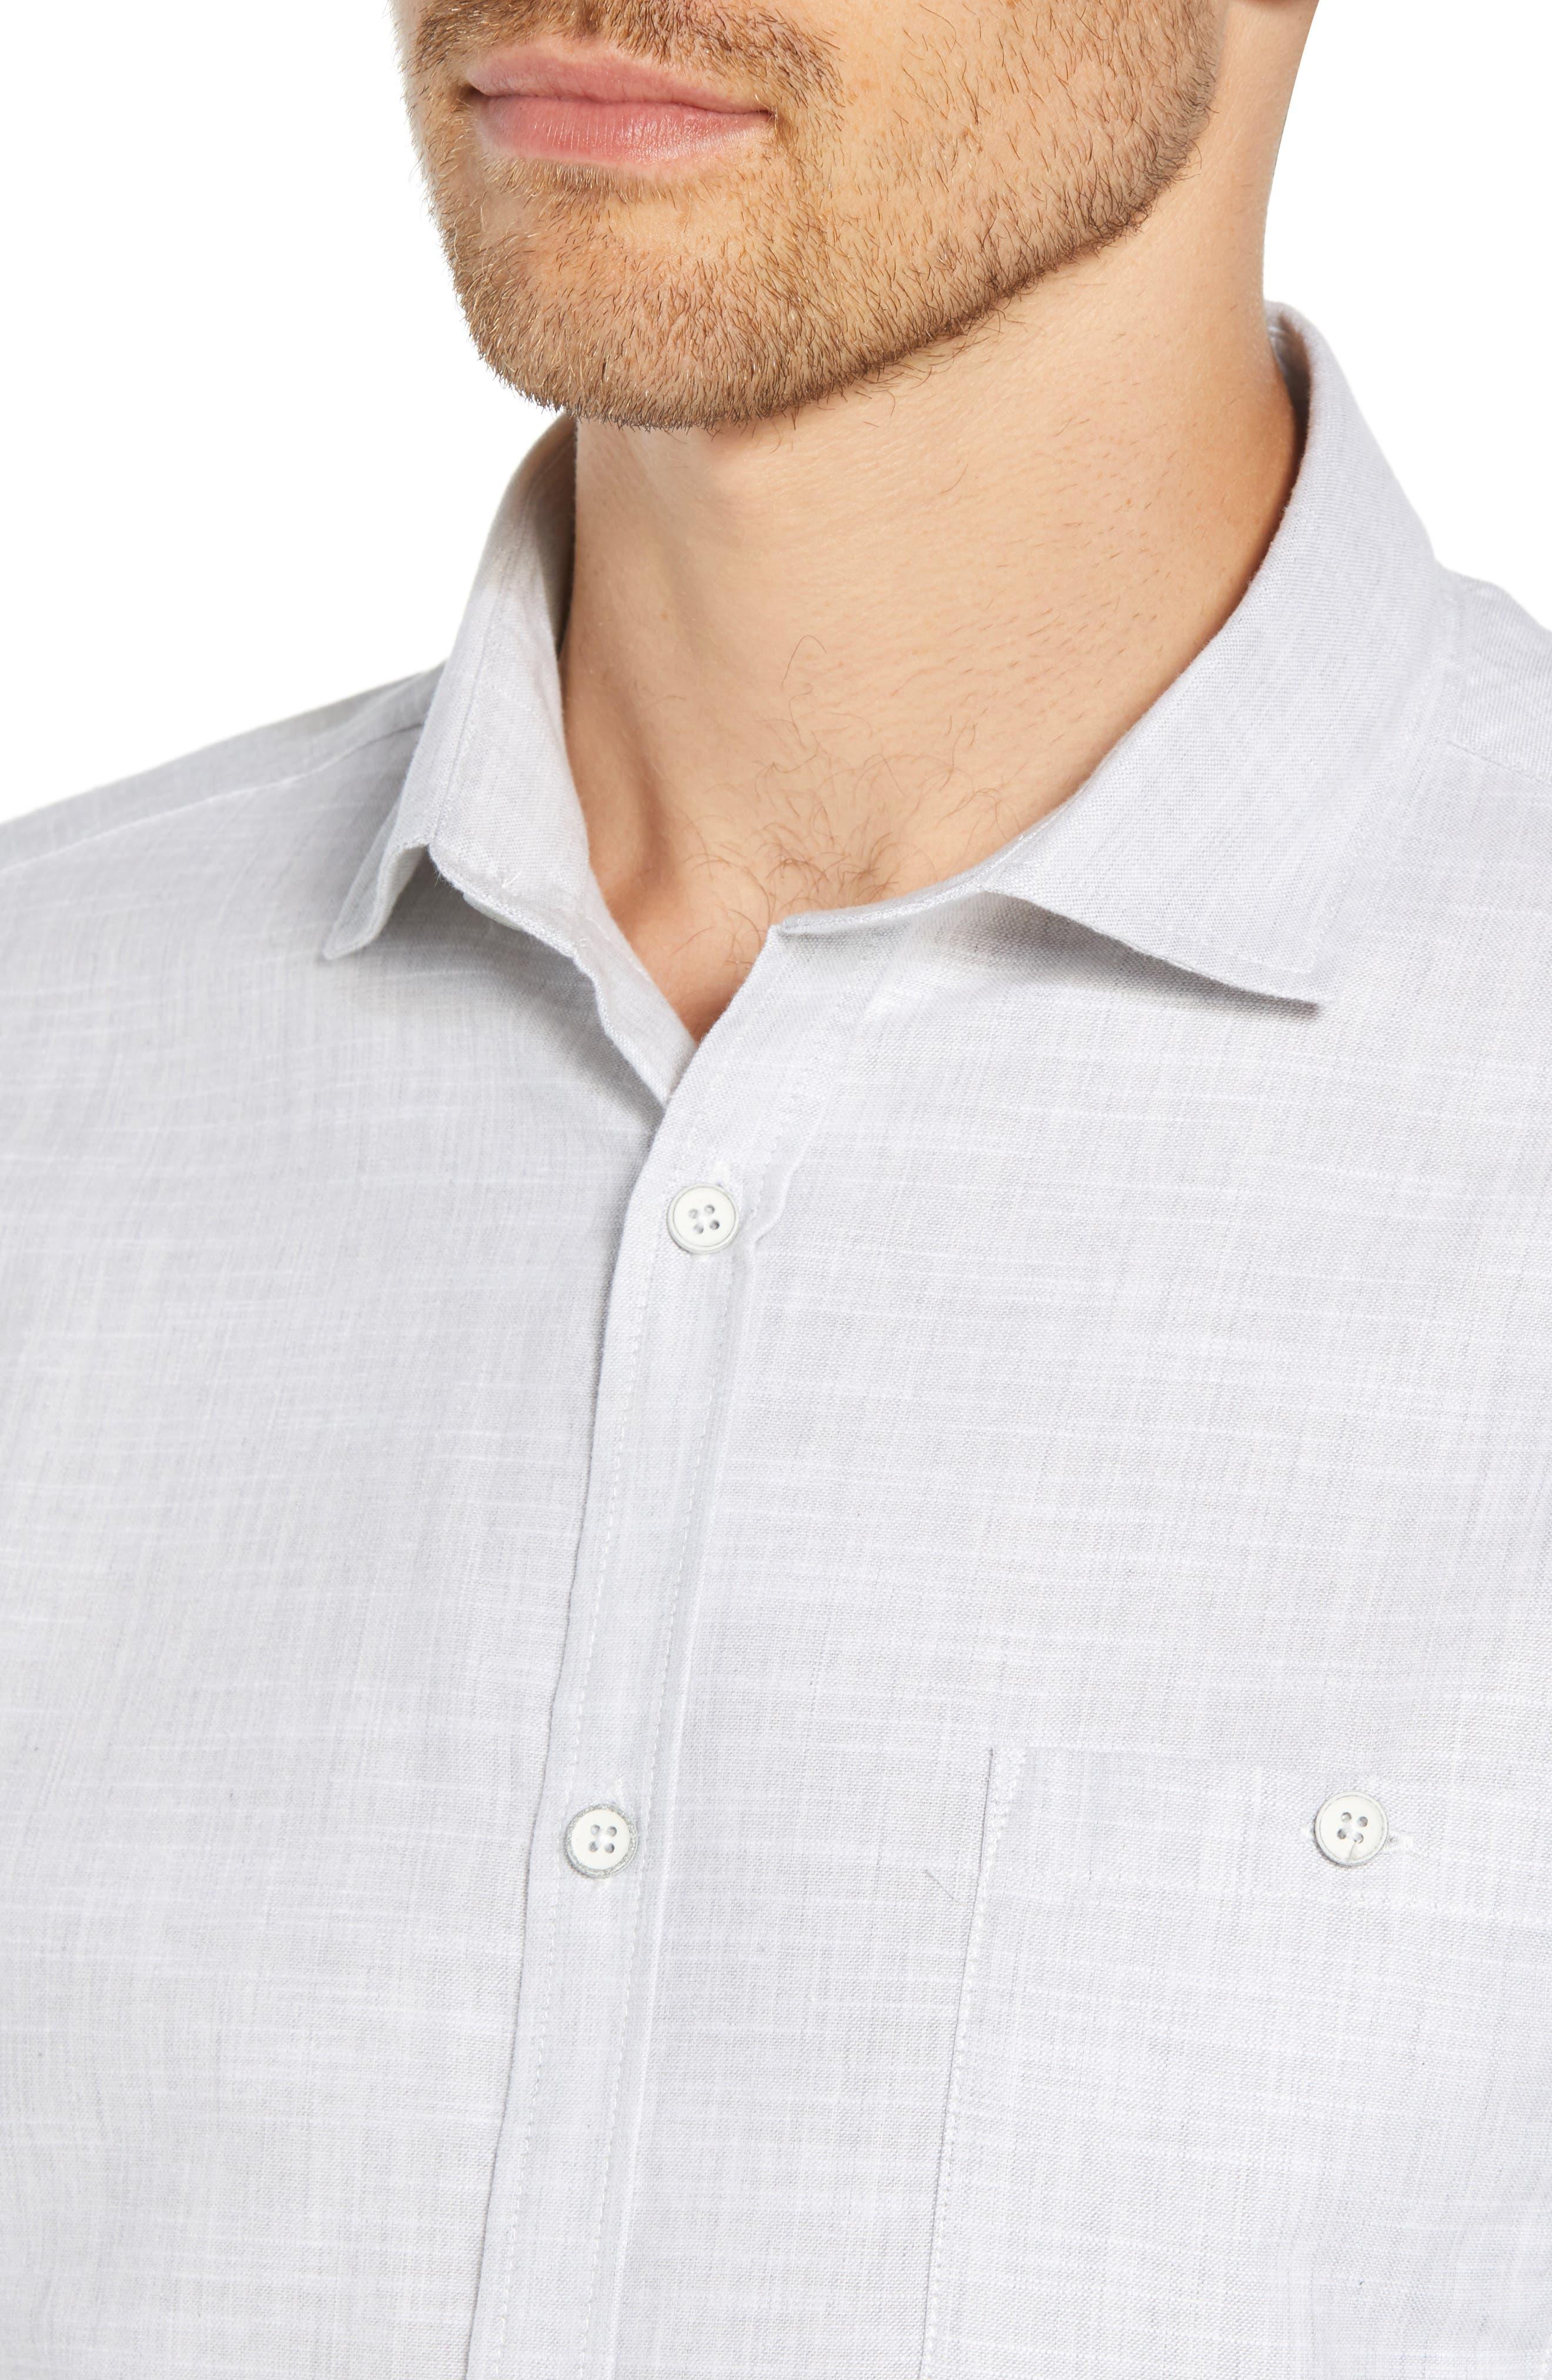 Rugger Regular Fit Sport Shirt,                             Alternate thumbnail 2, color,                             LIGHT GREY